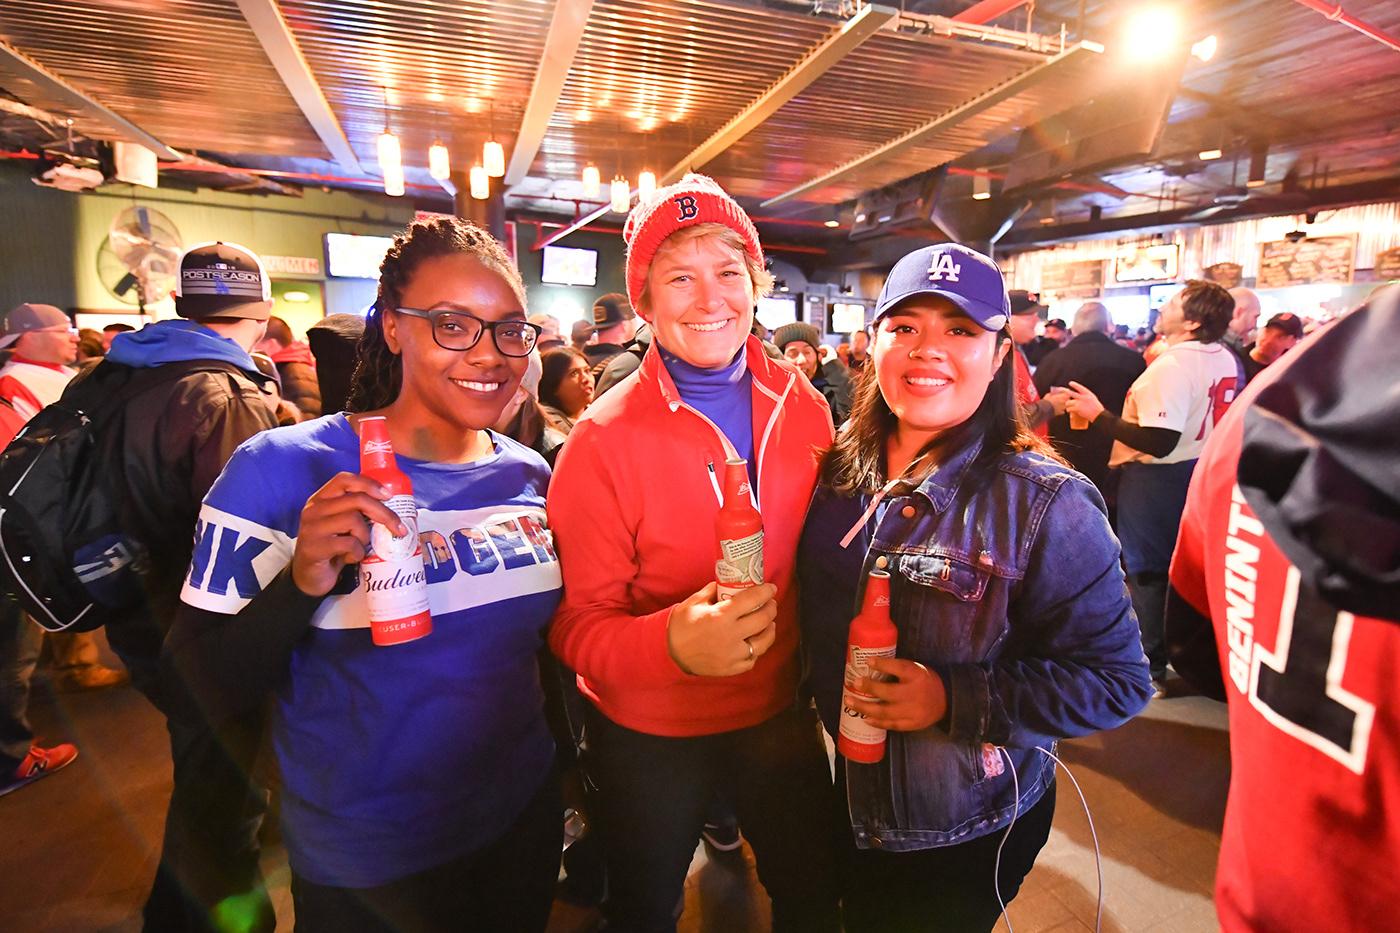 World Series Game 2 Fenway Park on Behance